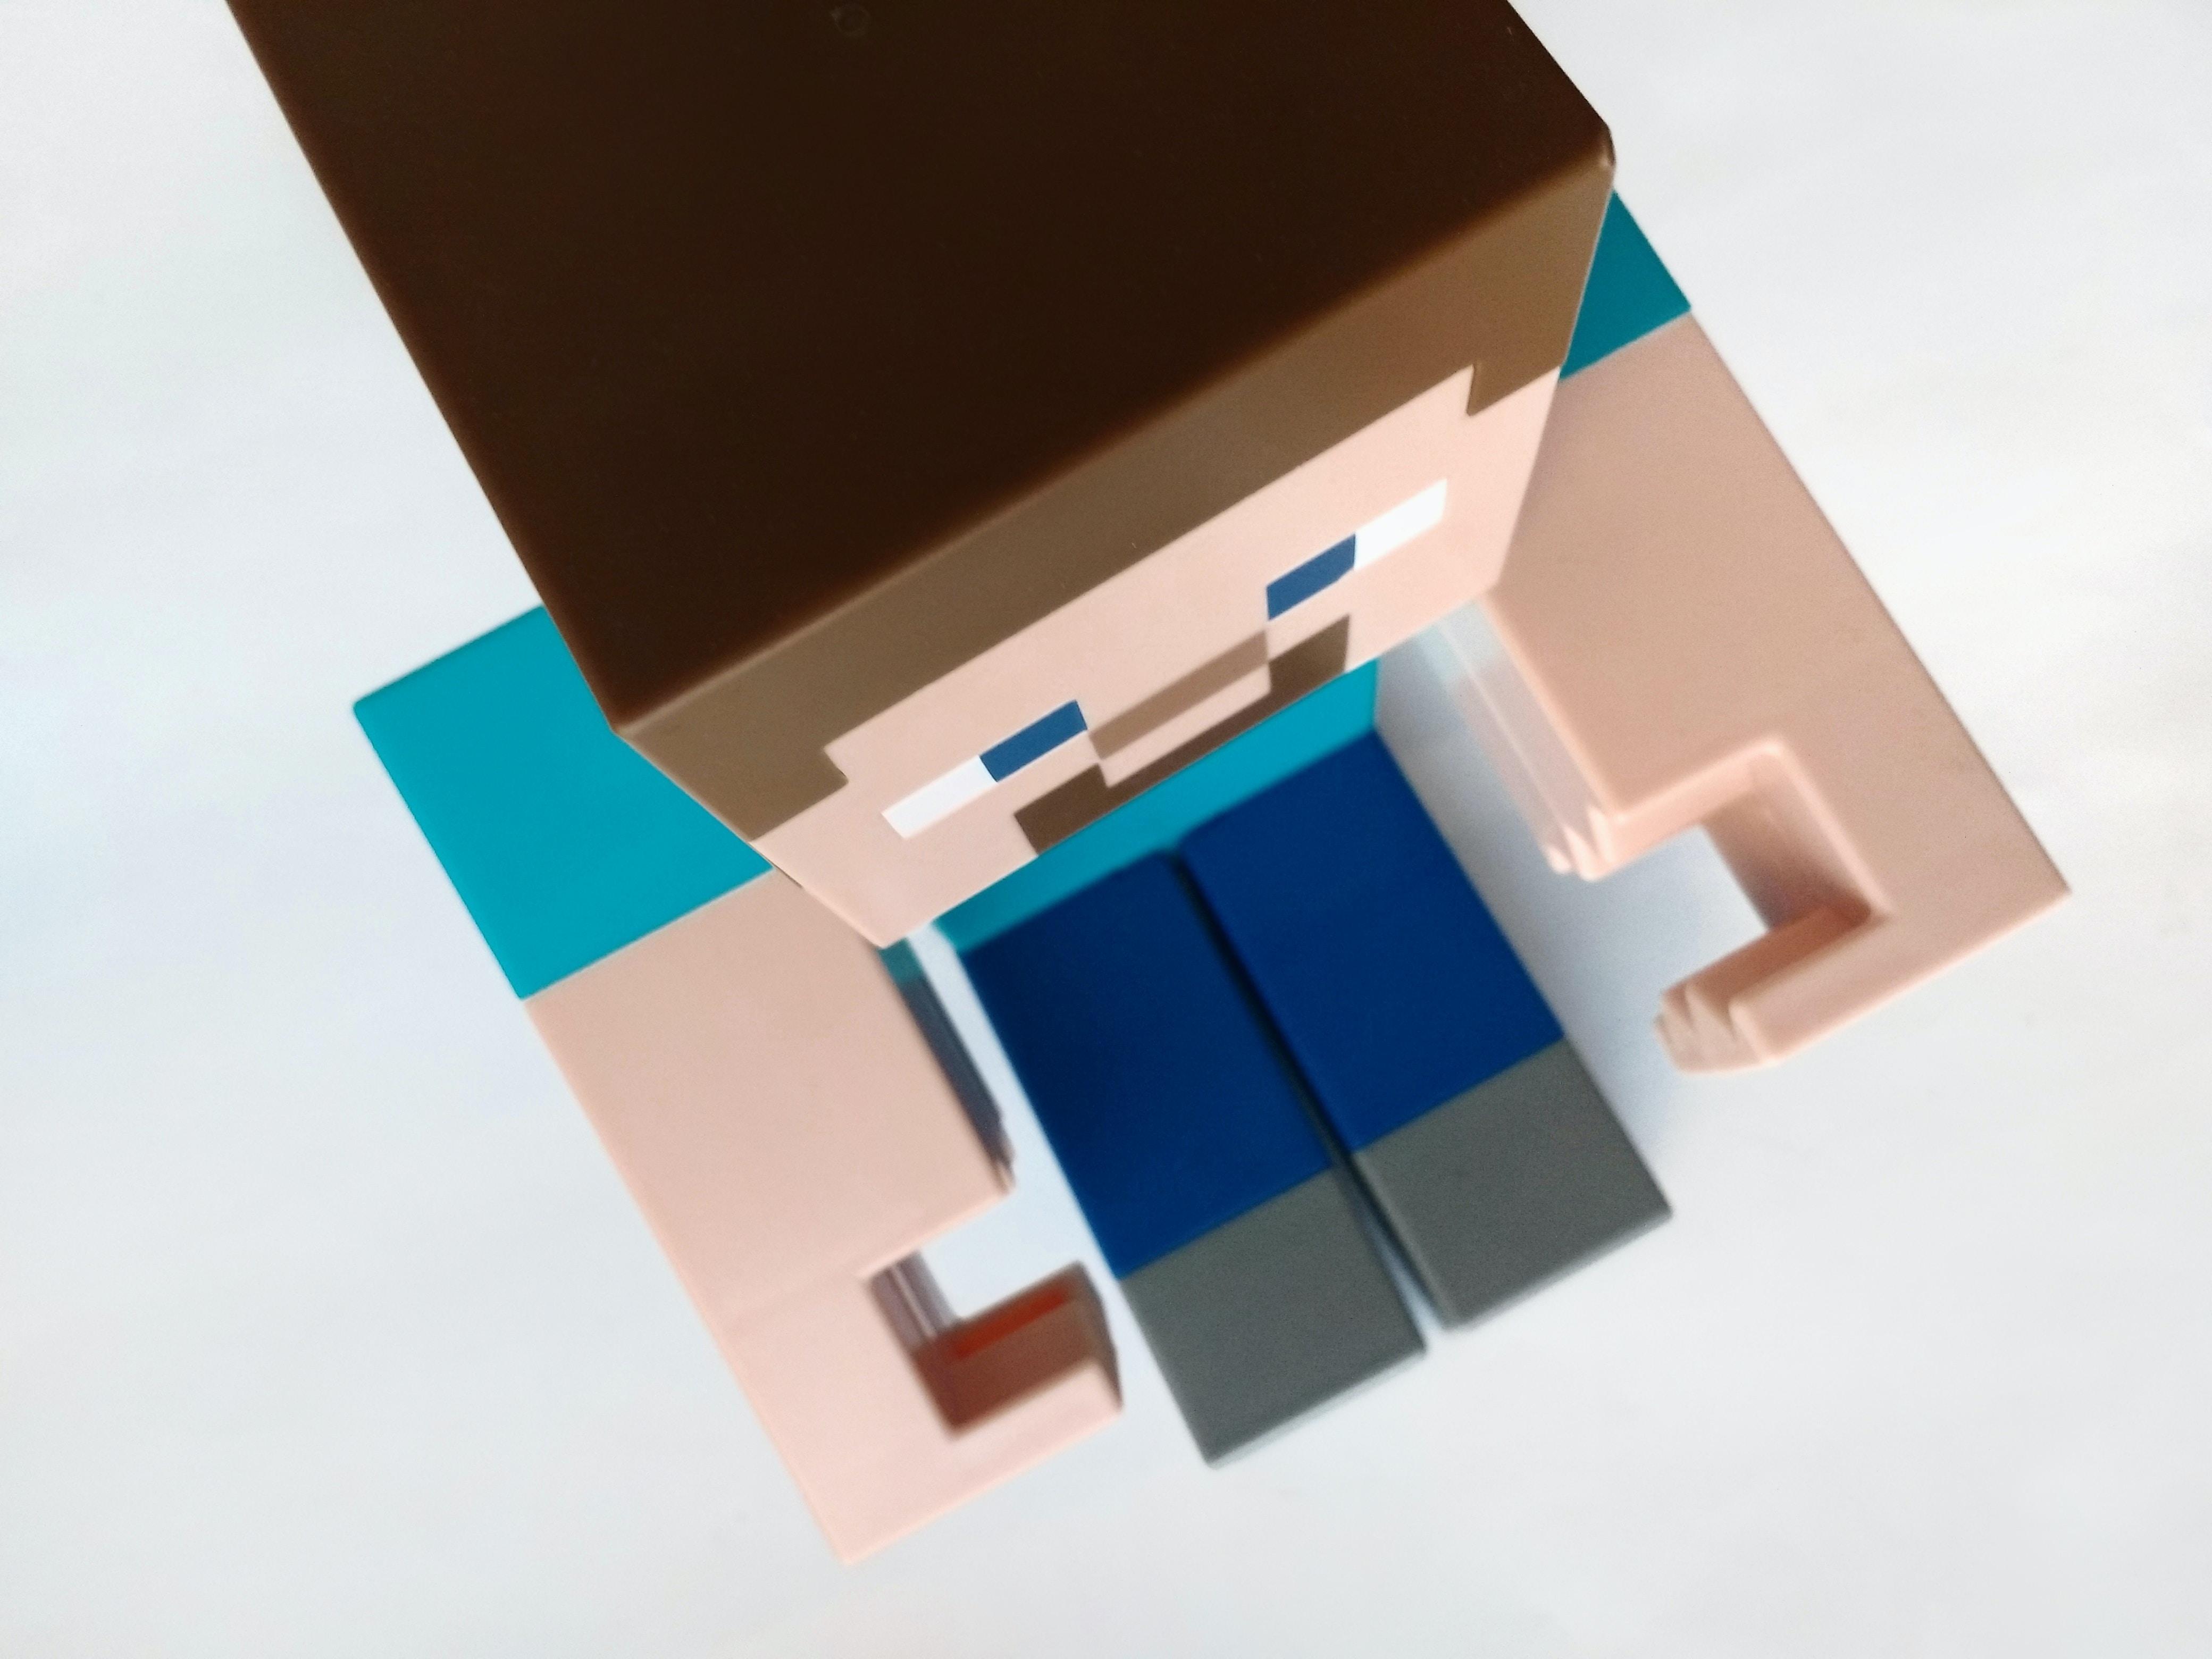 Minecraft Steve toy